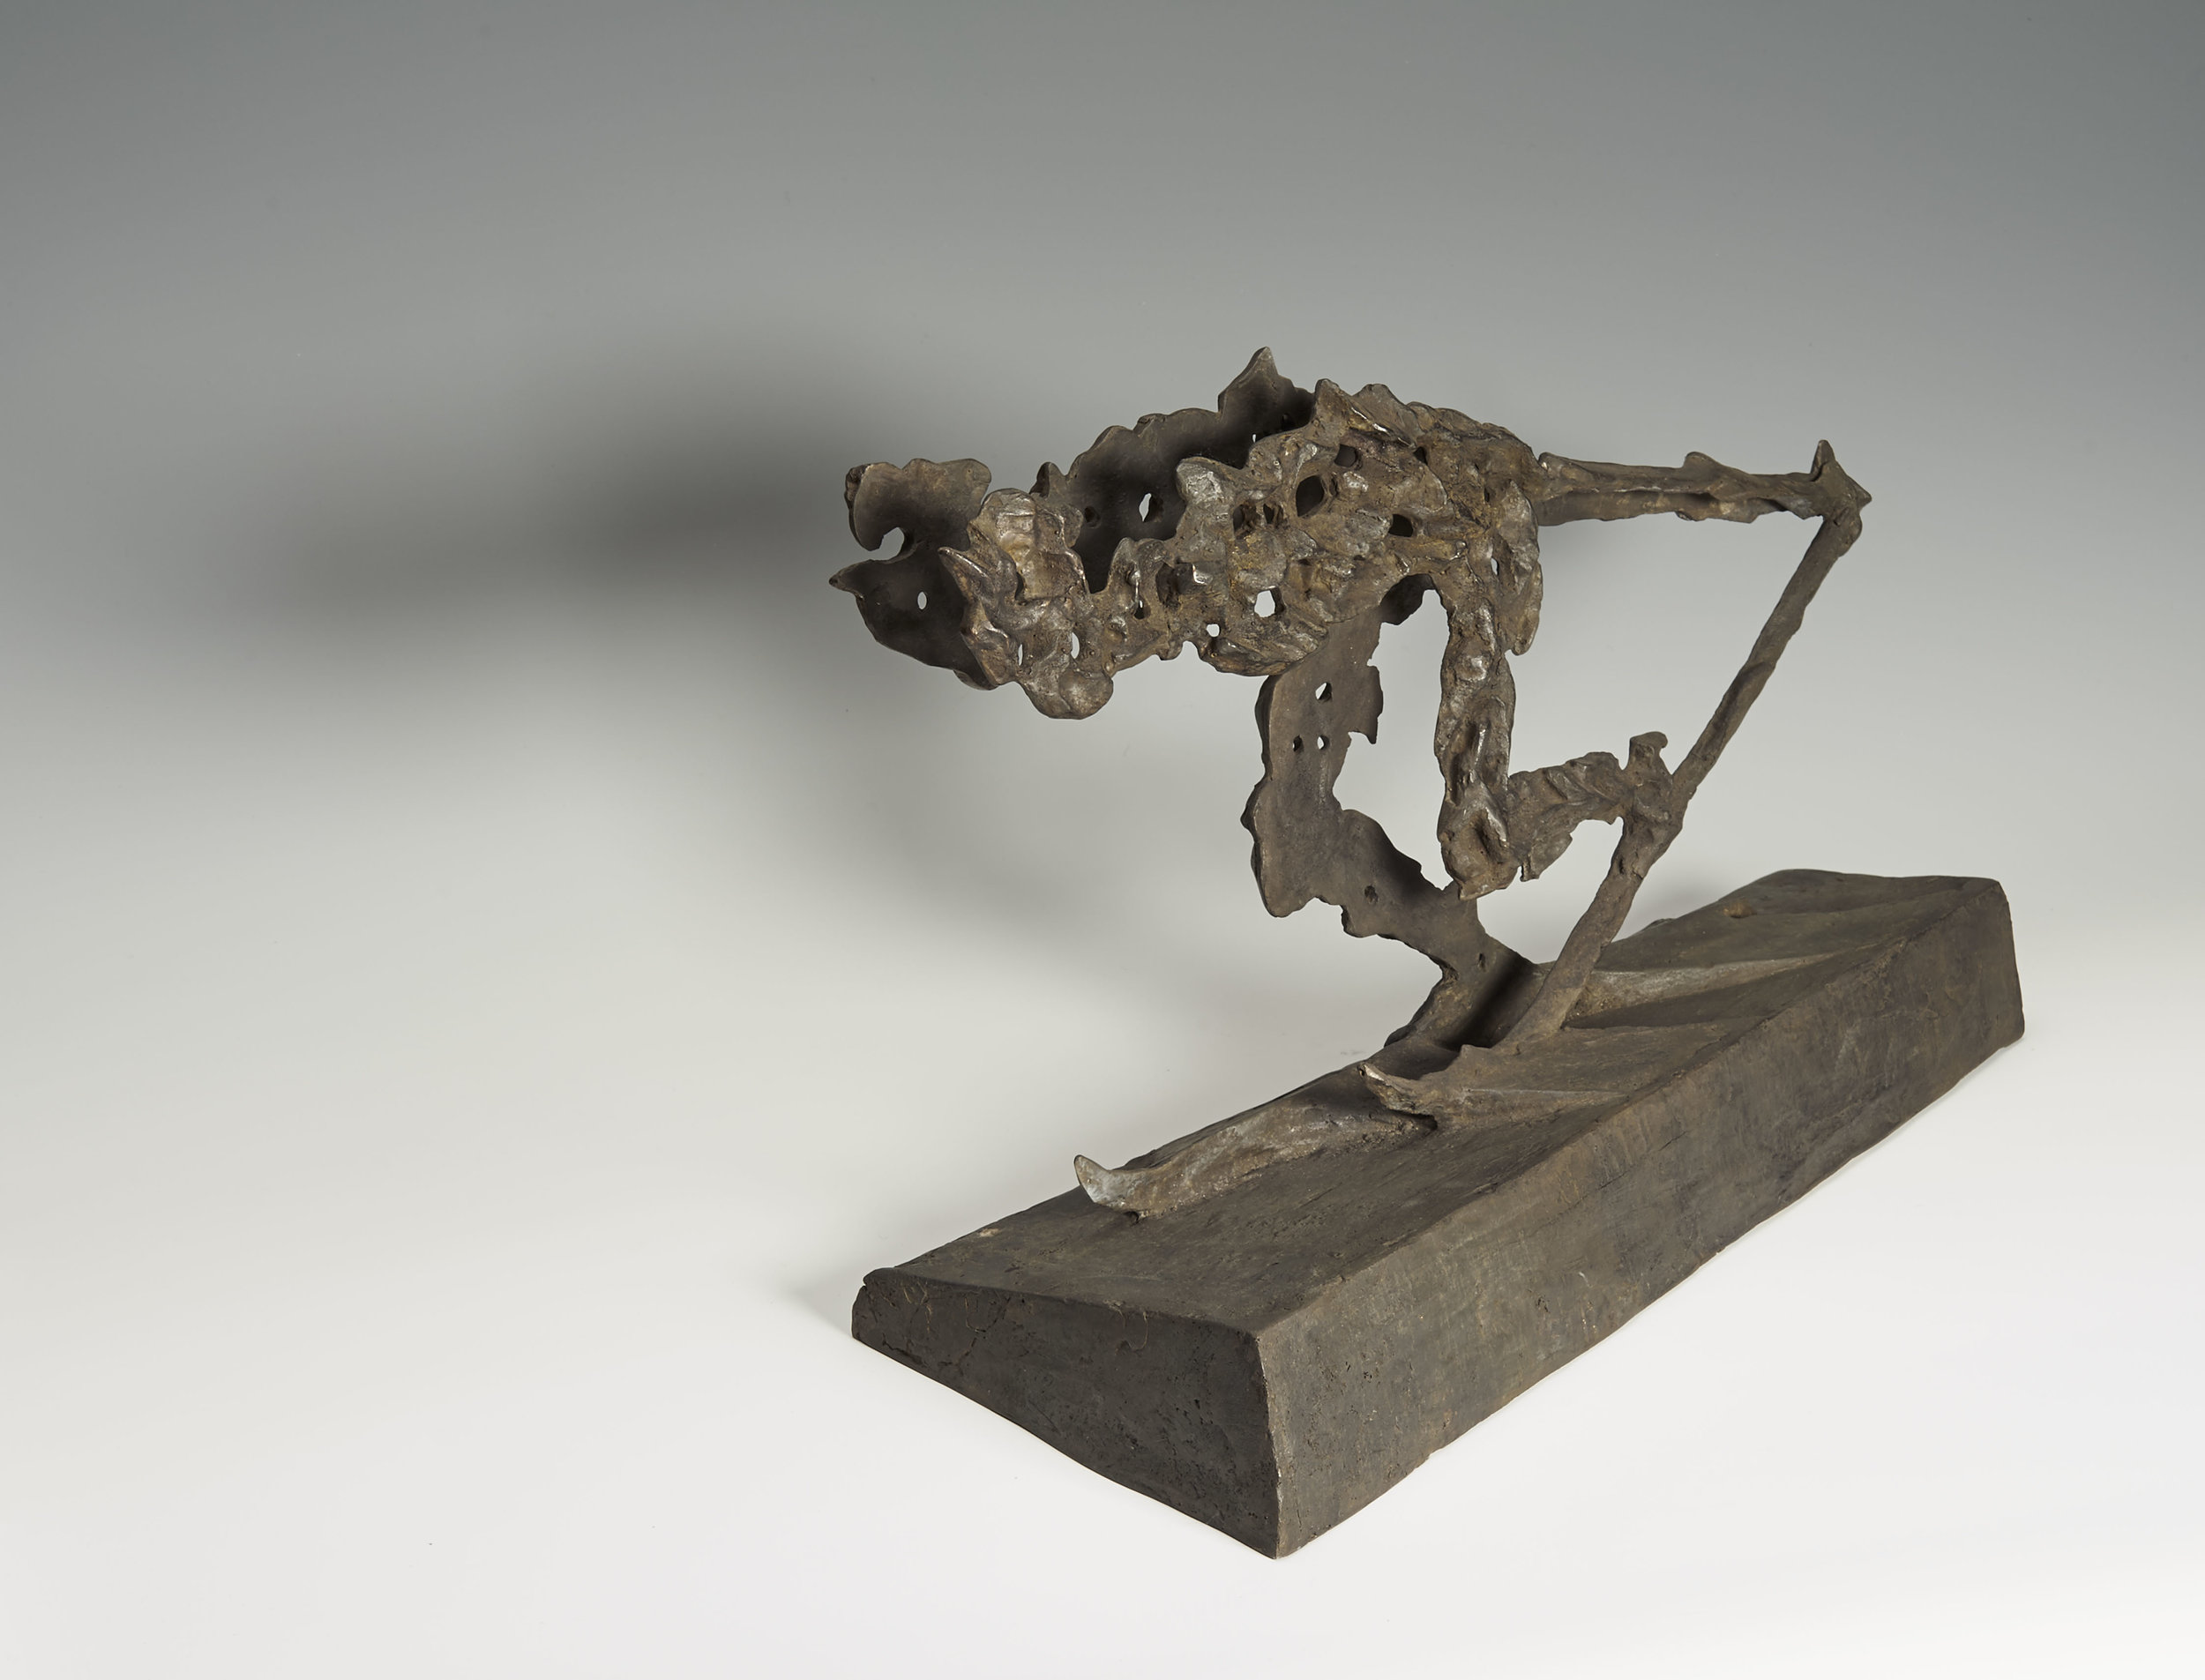 Wille und Widerstand, (il sclev dal sport), 2005. Bronze. H 30; L 50